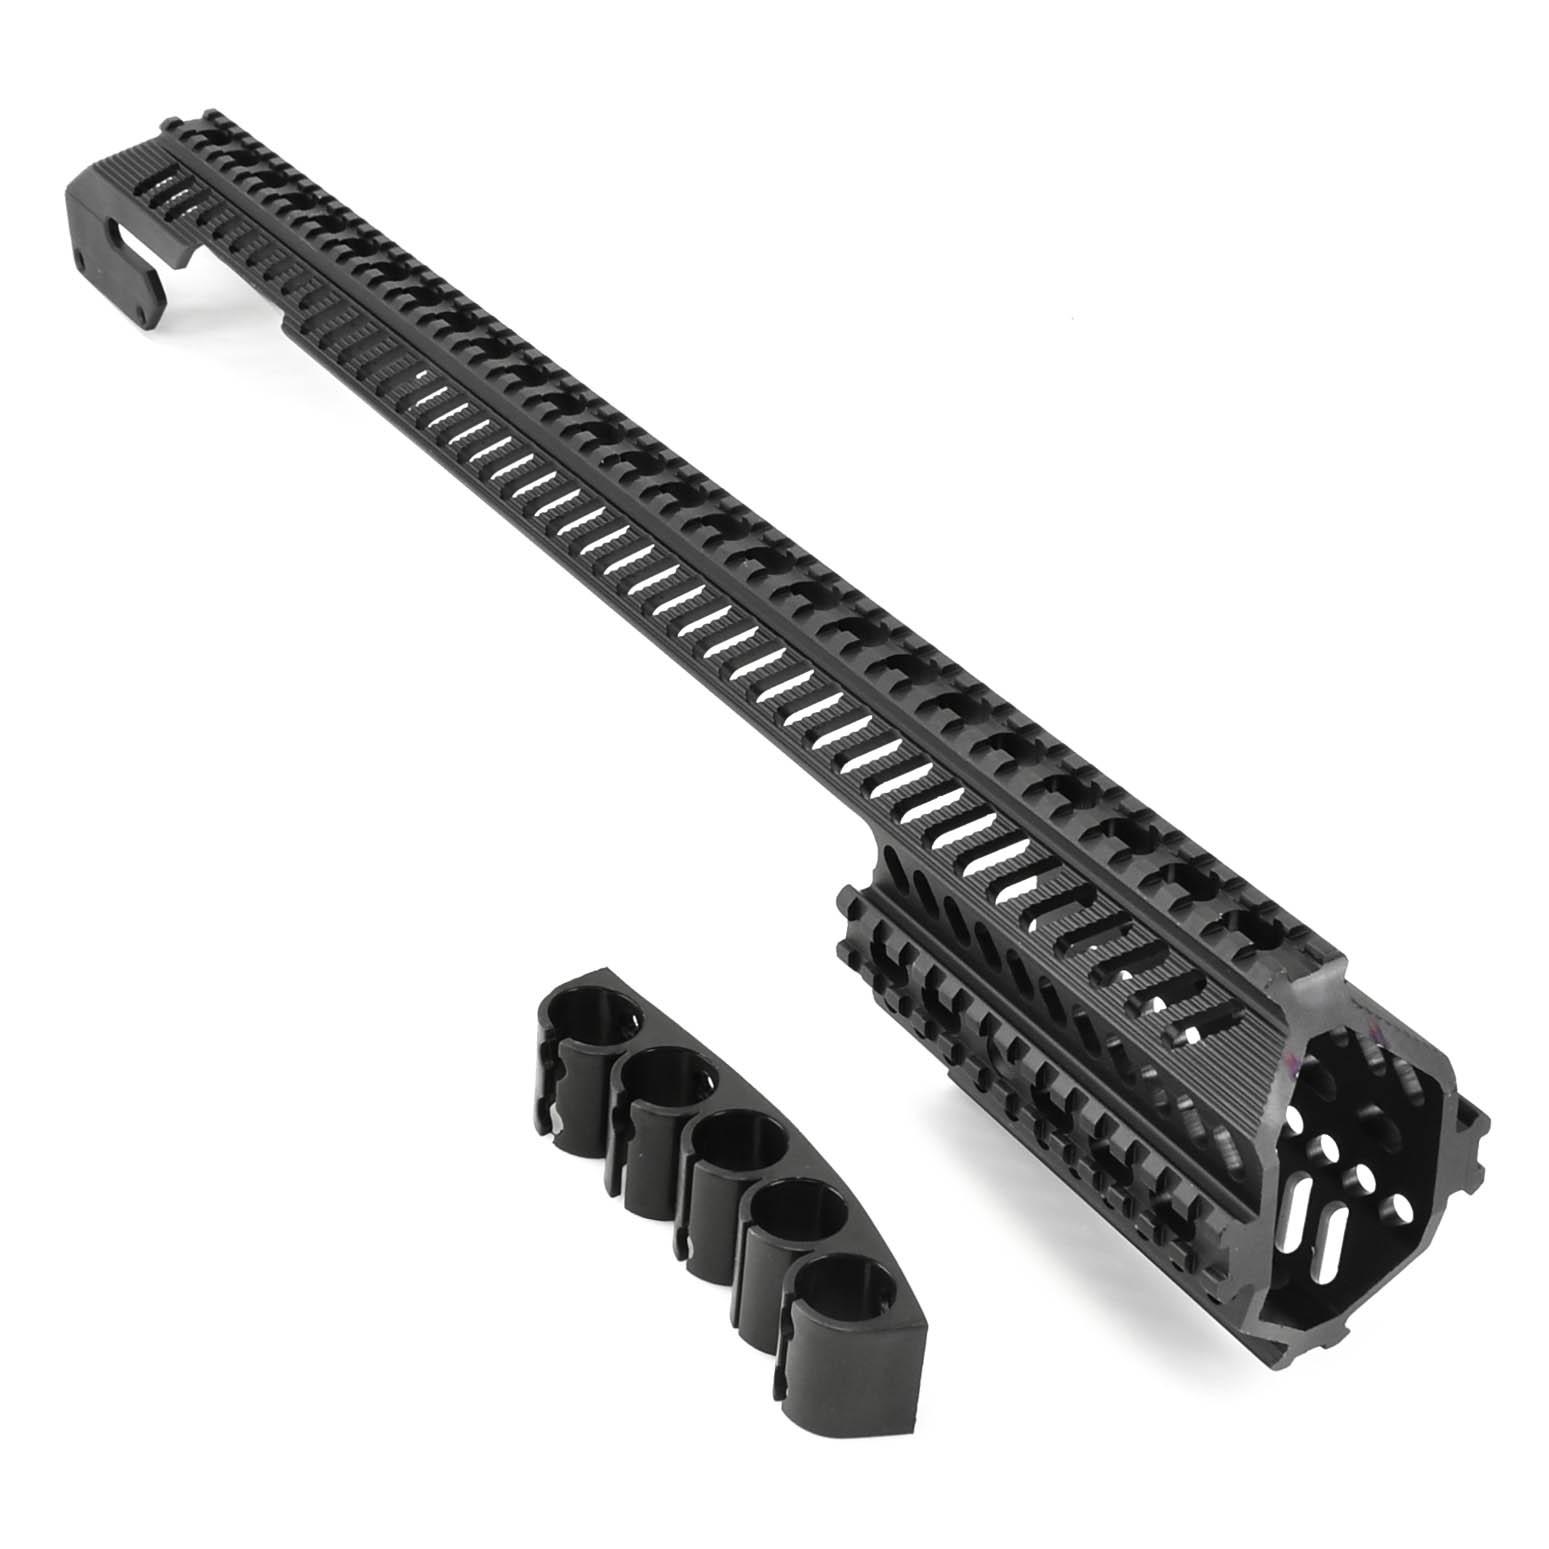 Tactical aluminium Mount 12 gauge 870 double Picatinny//Weaver rail